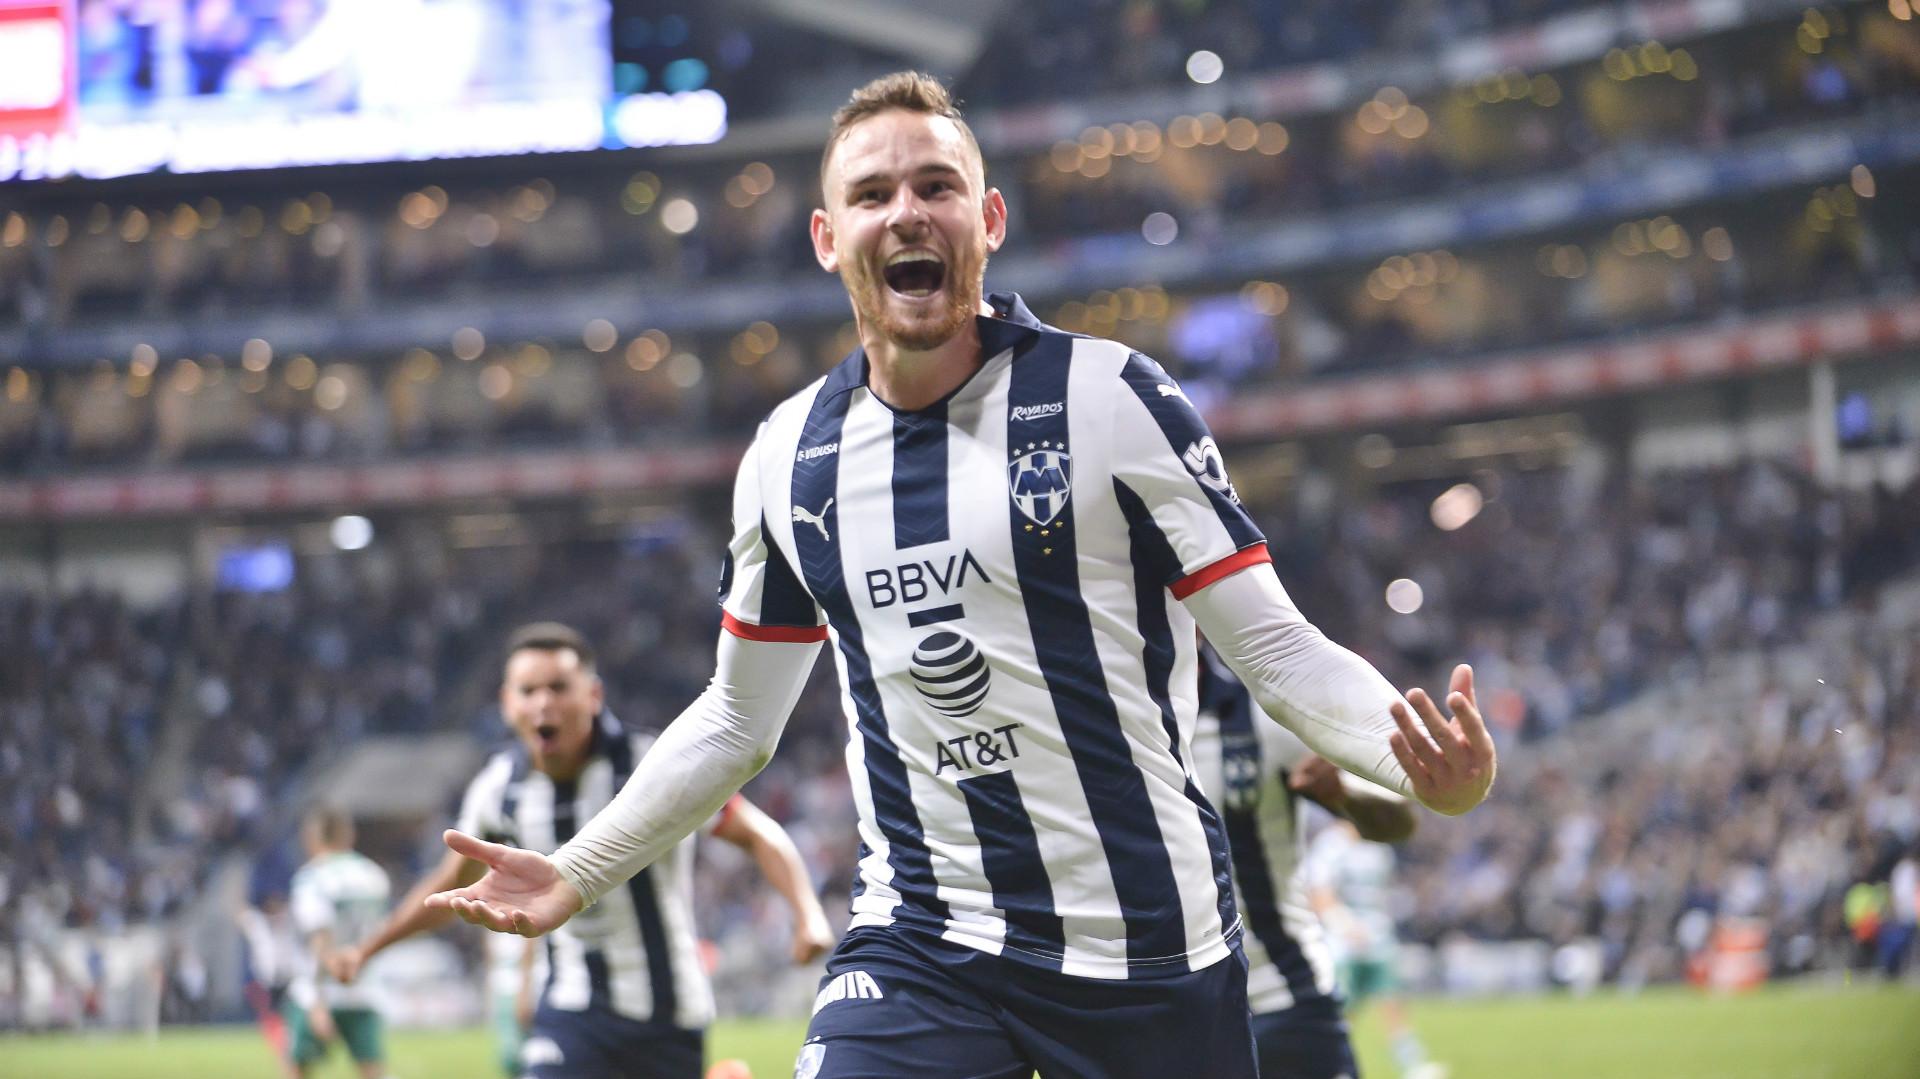 Liga MX Is Better Than Eredivisie - Janssen